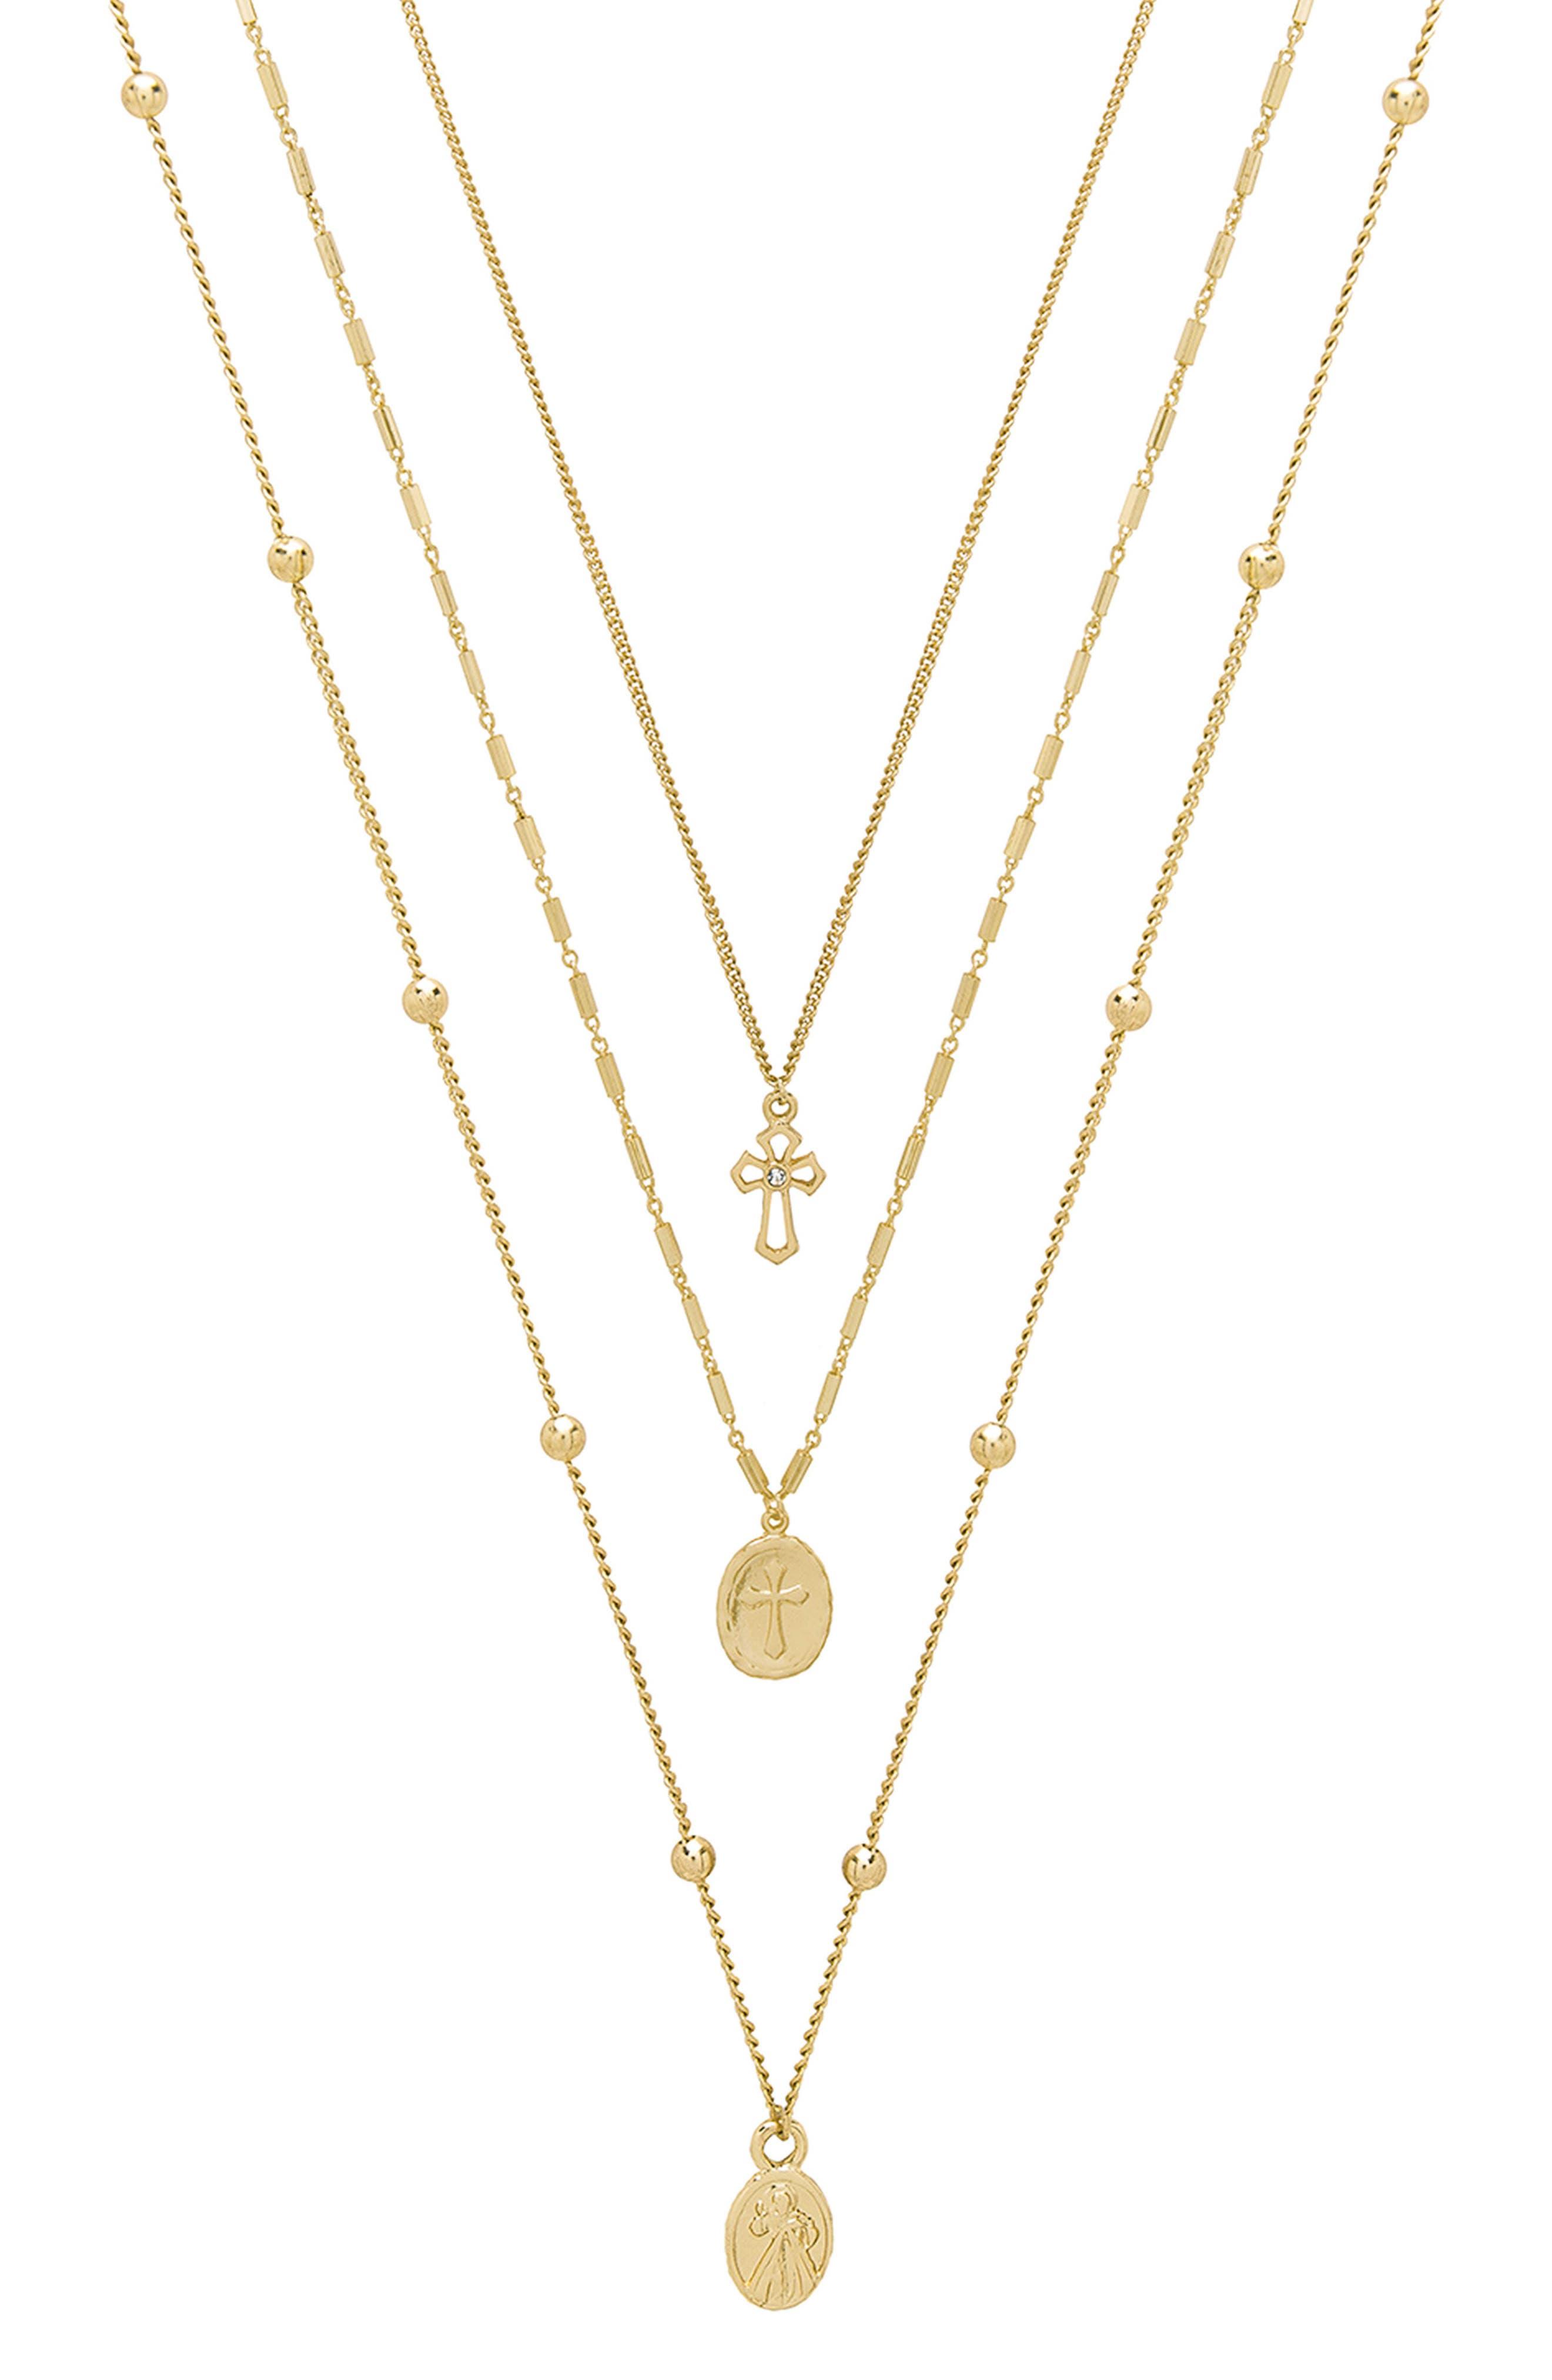 Set of 3 Cross Necklaces,                             Main thumbnail 1, color,                             710